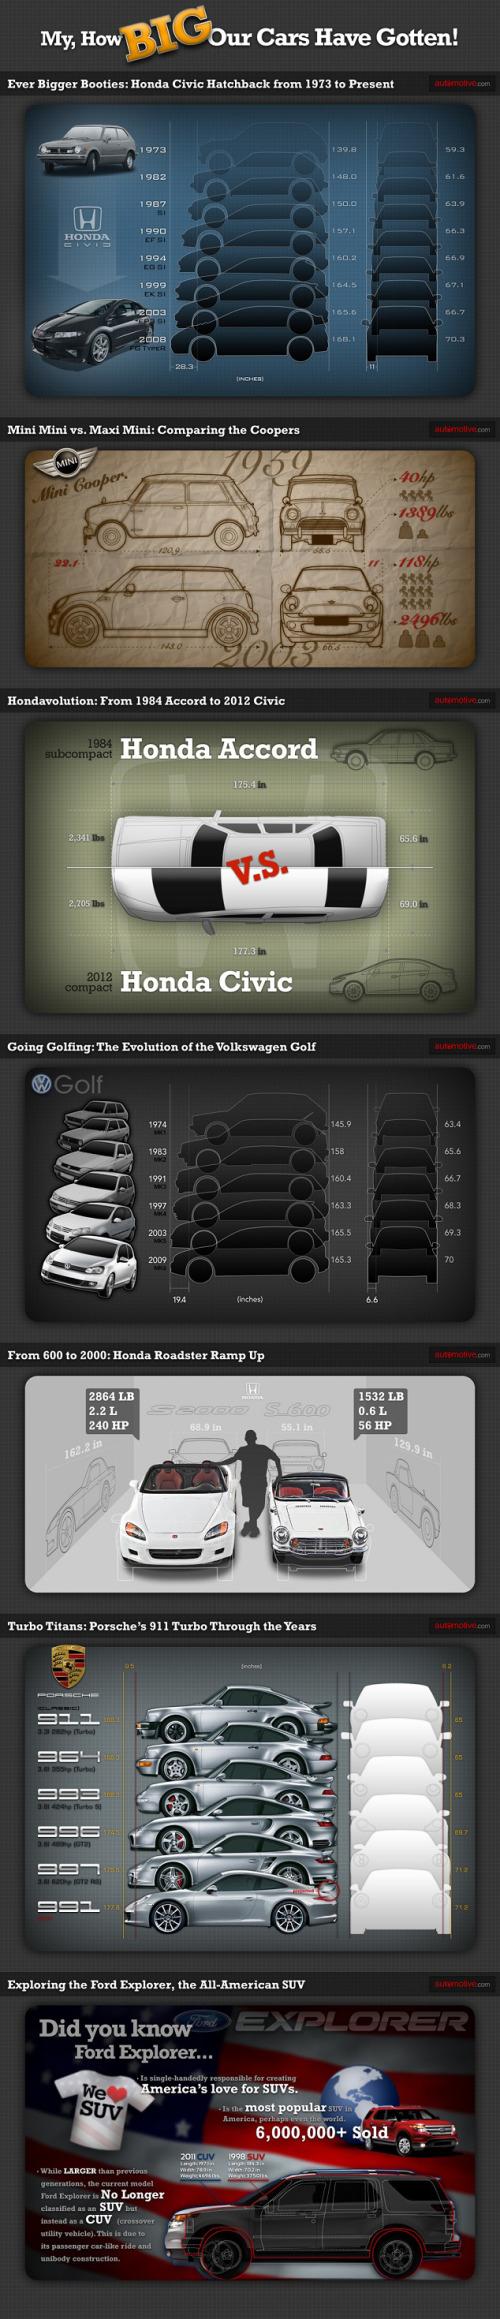 Automobily - infografika